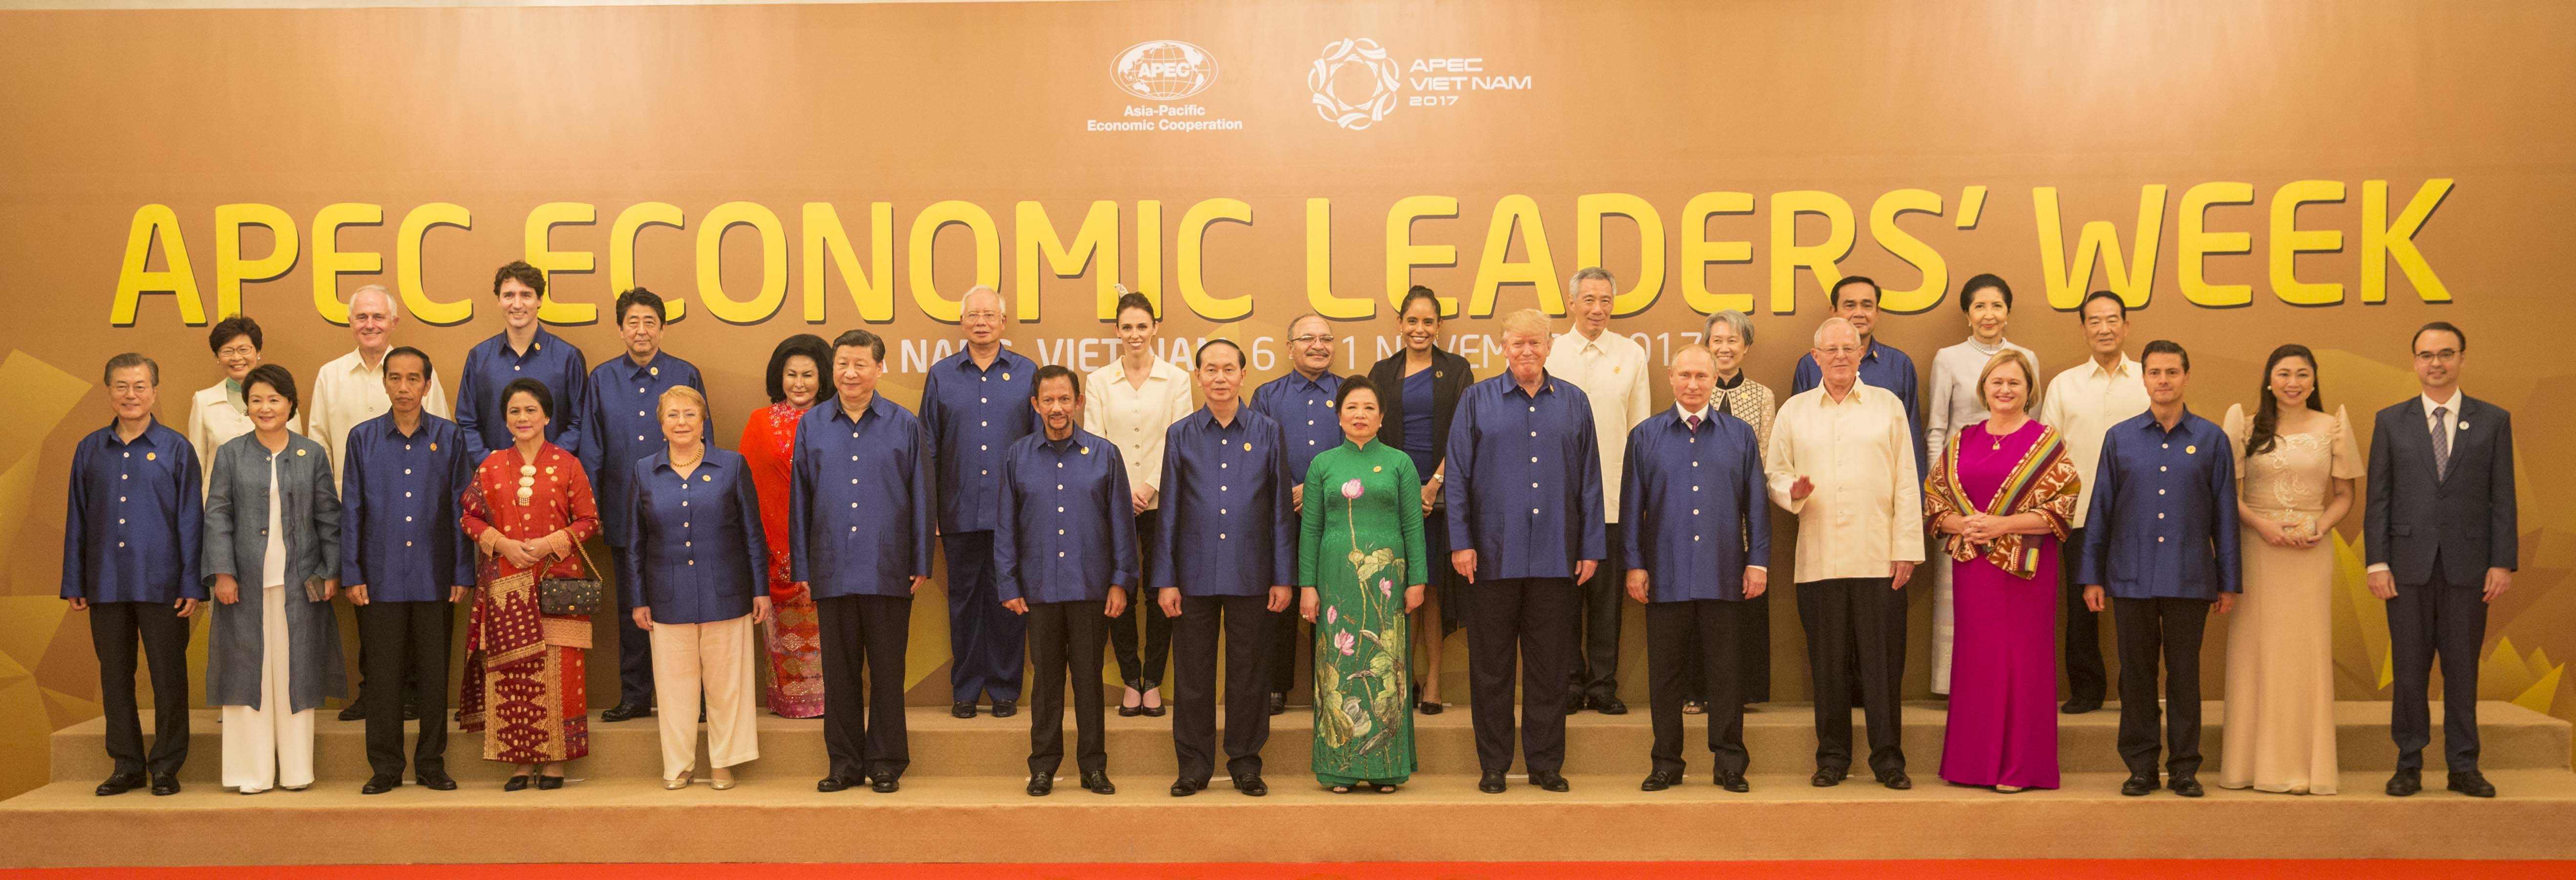 https://upload.wikimedia.org/wikipedia/commons/f/fa/APEC_Economic_Leaders%27_Week.jpg